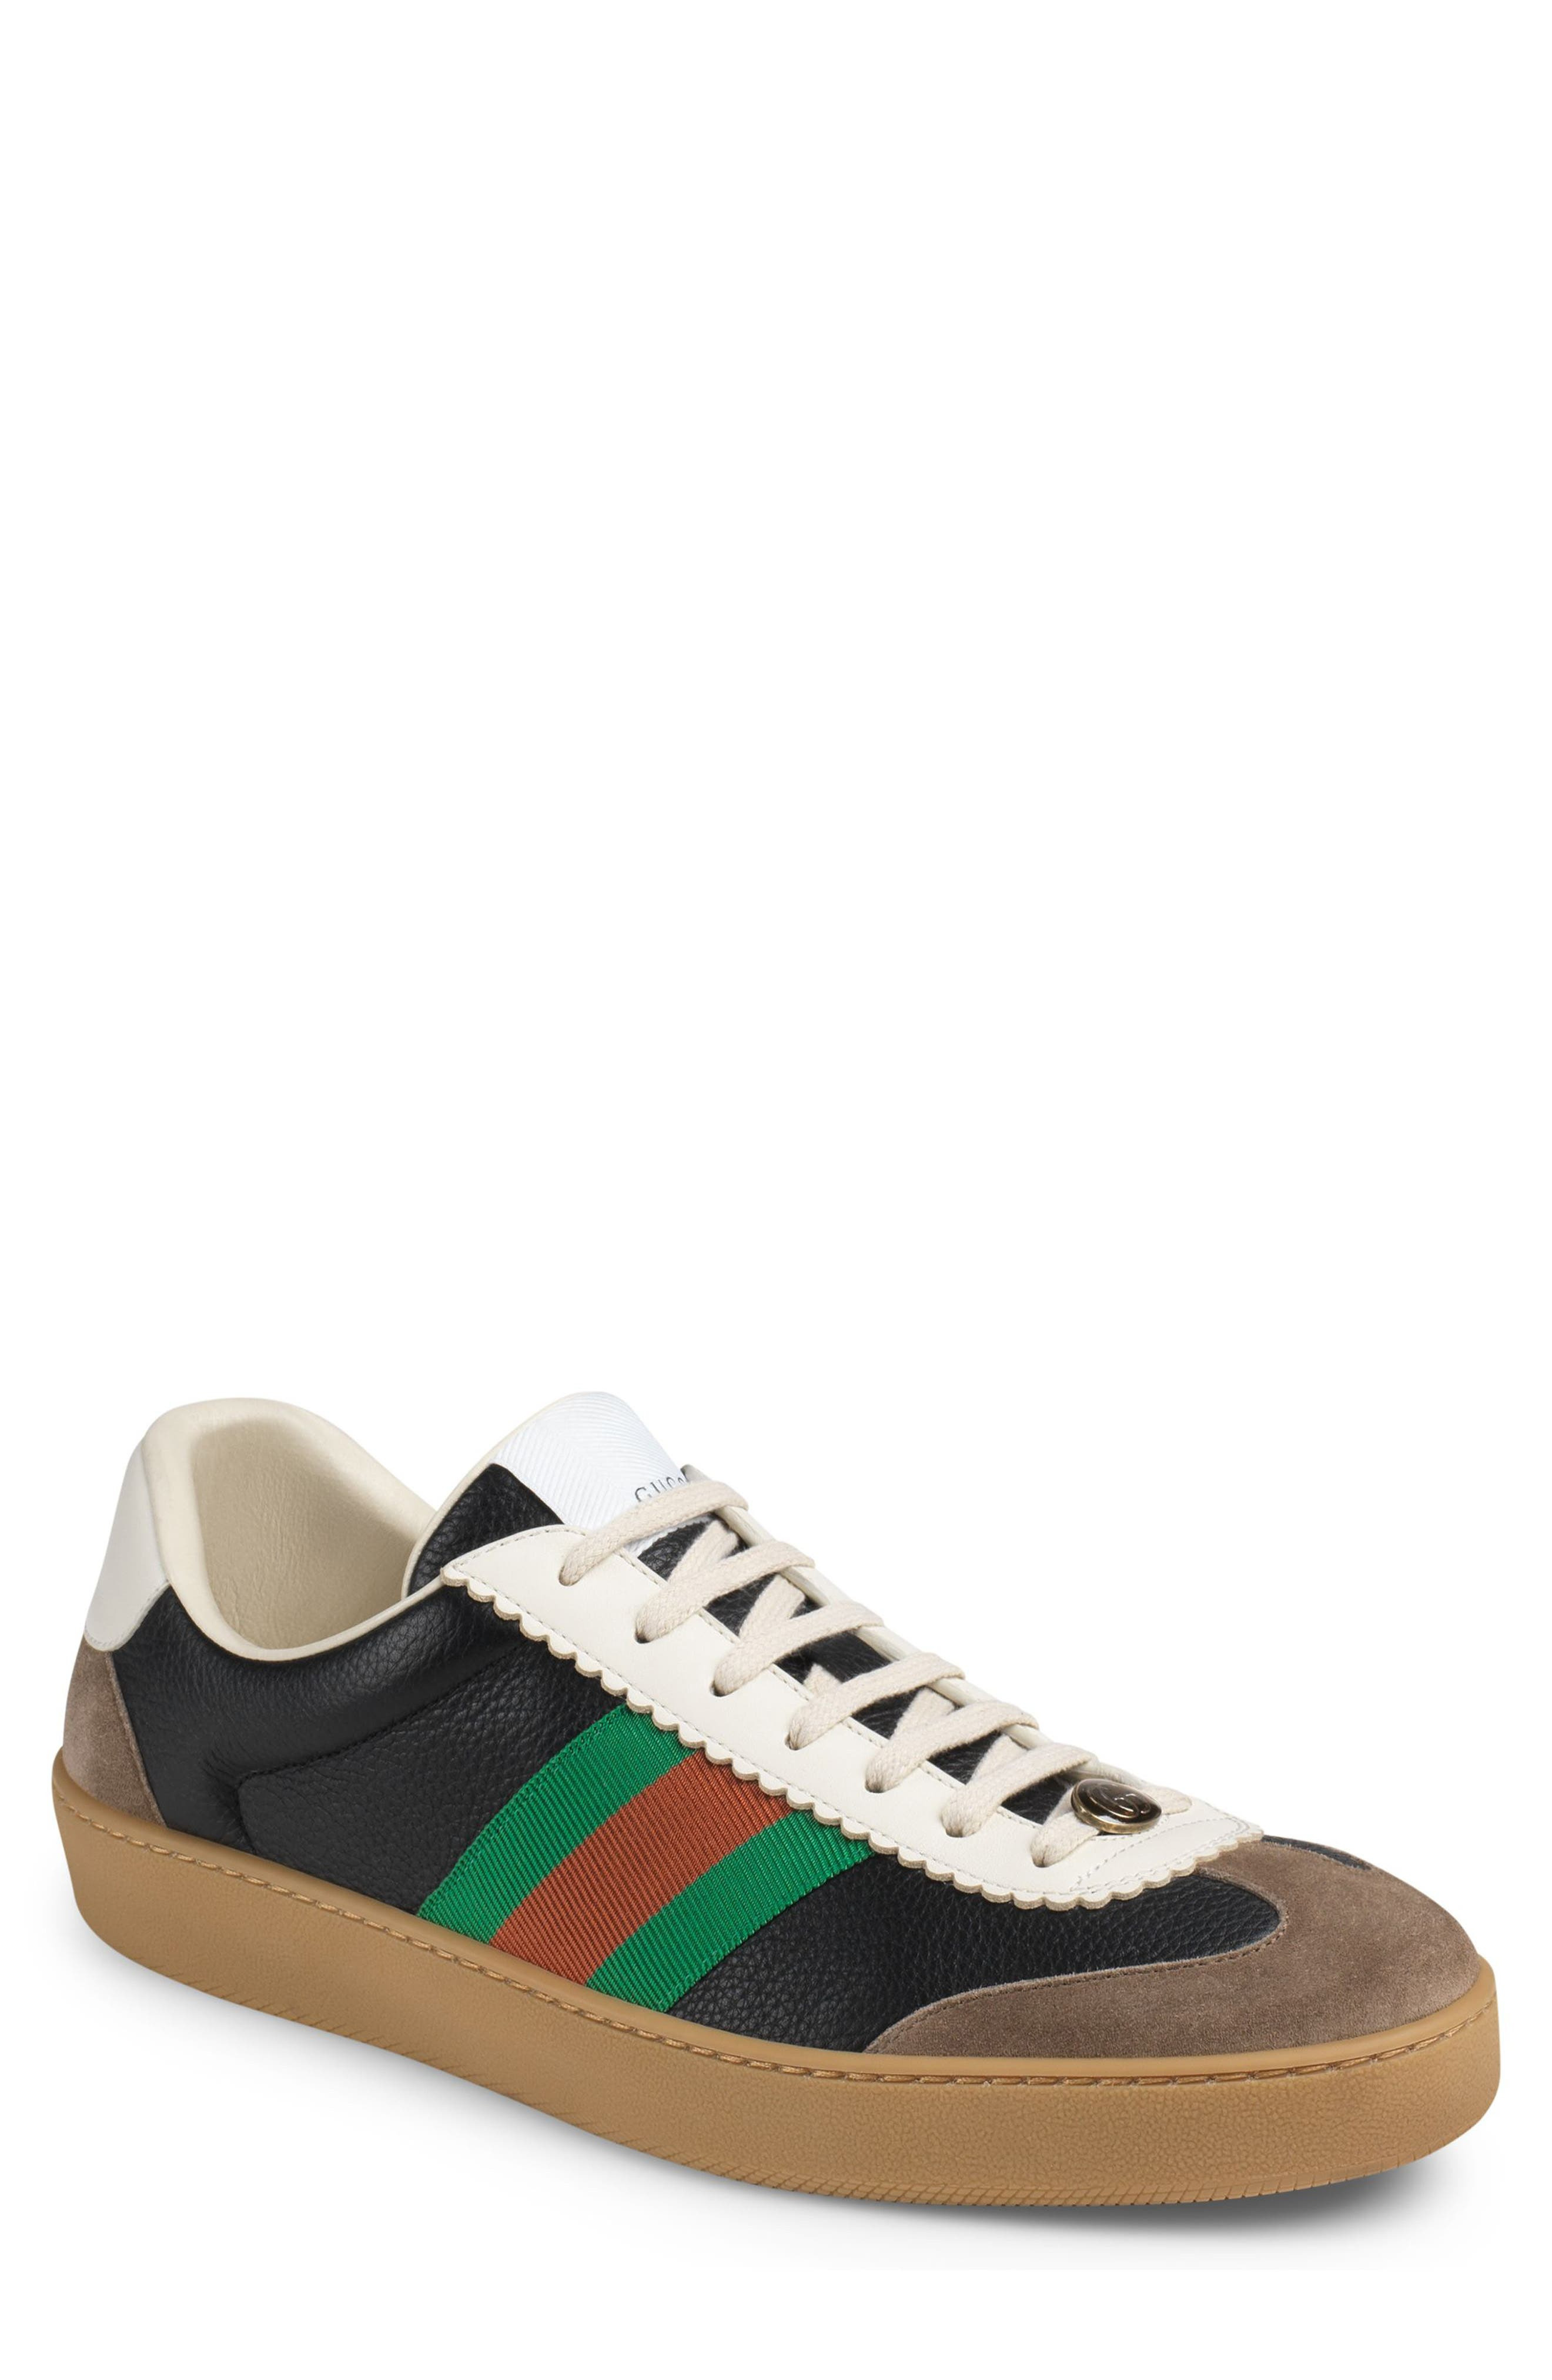 Web Sneaker,                         Main,                         color, ARDESIA/ BLACK